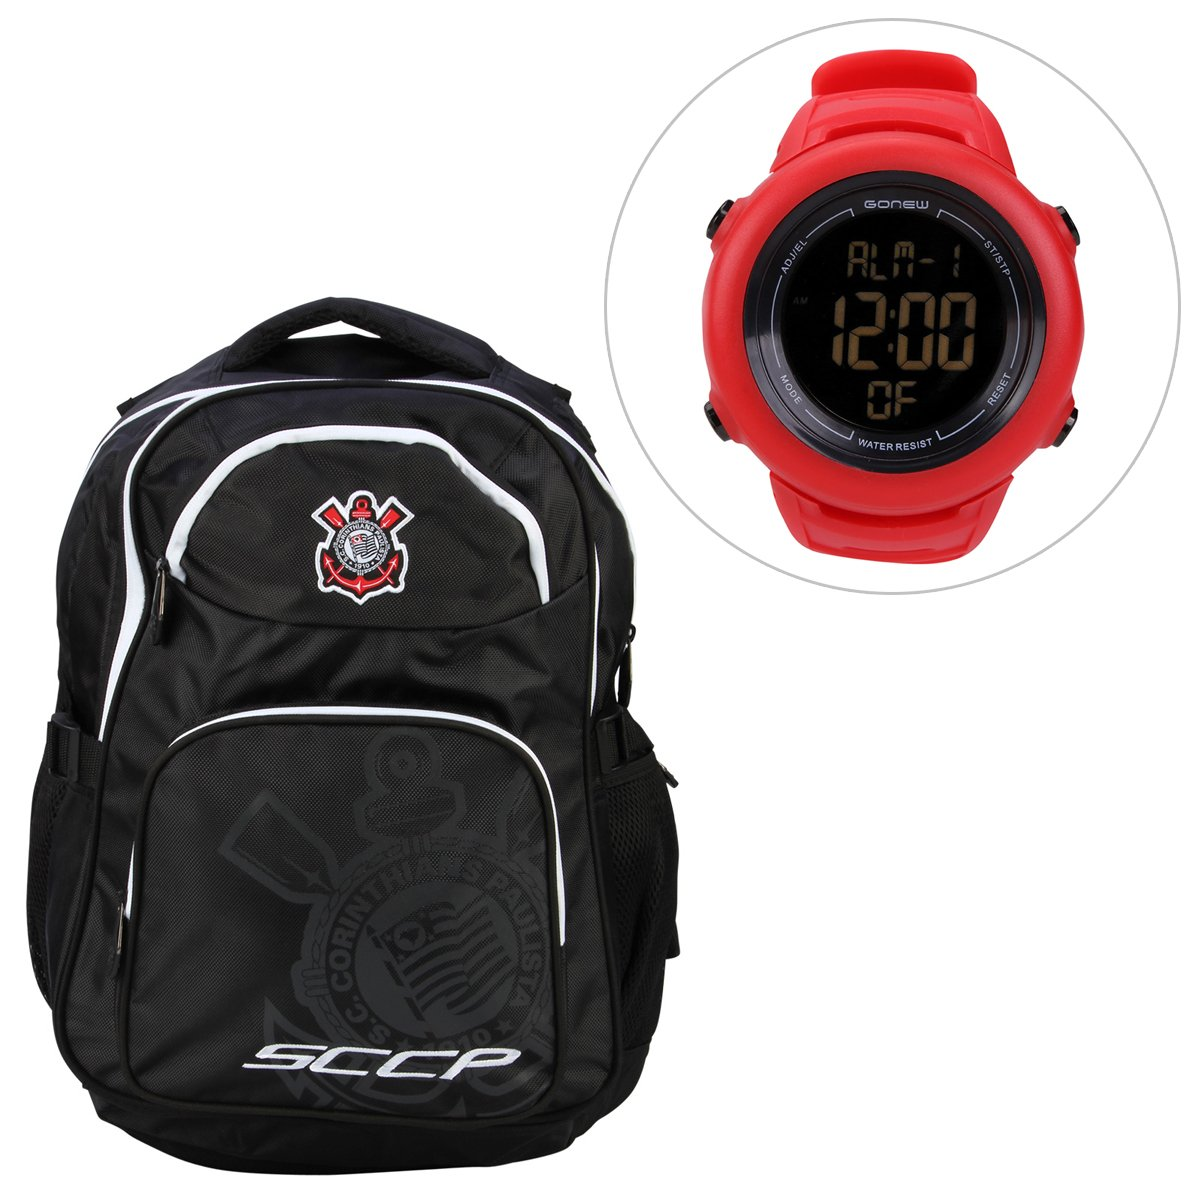 a7a723ccfbe Kit Mochila Corinthians + Relógio Gonew Energy 2 - Compre Agora ...